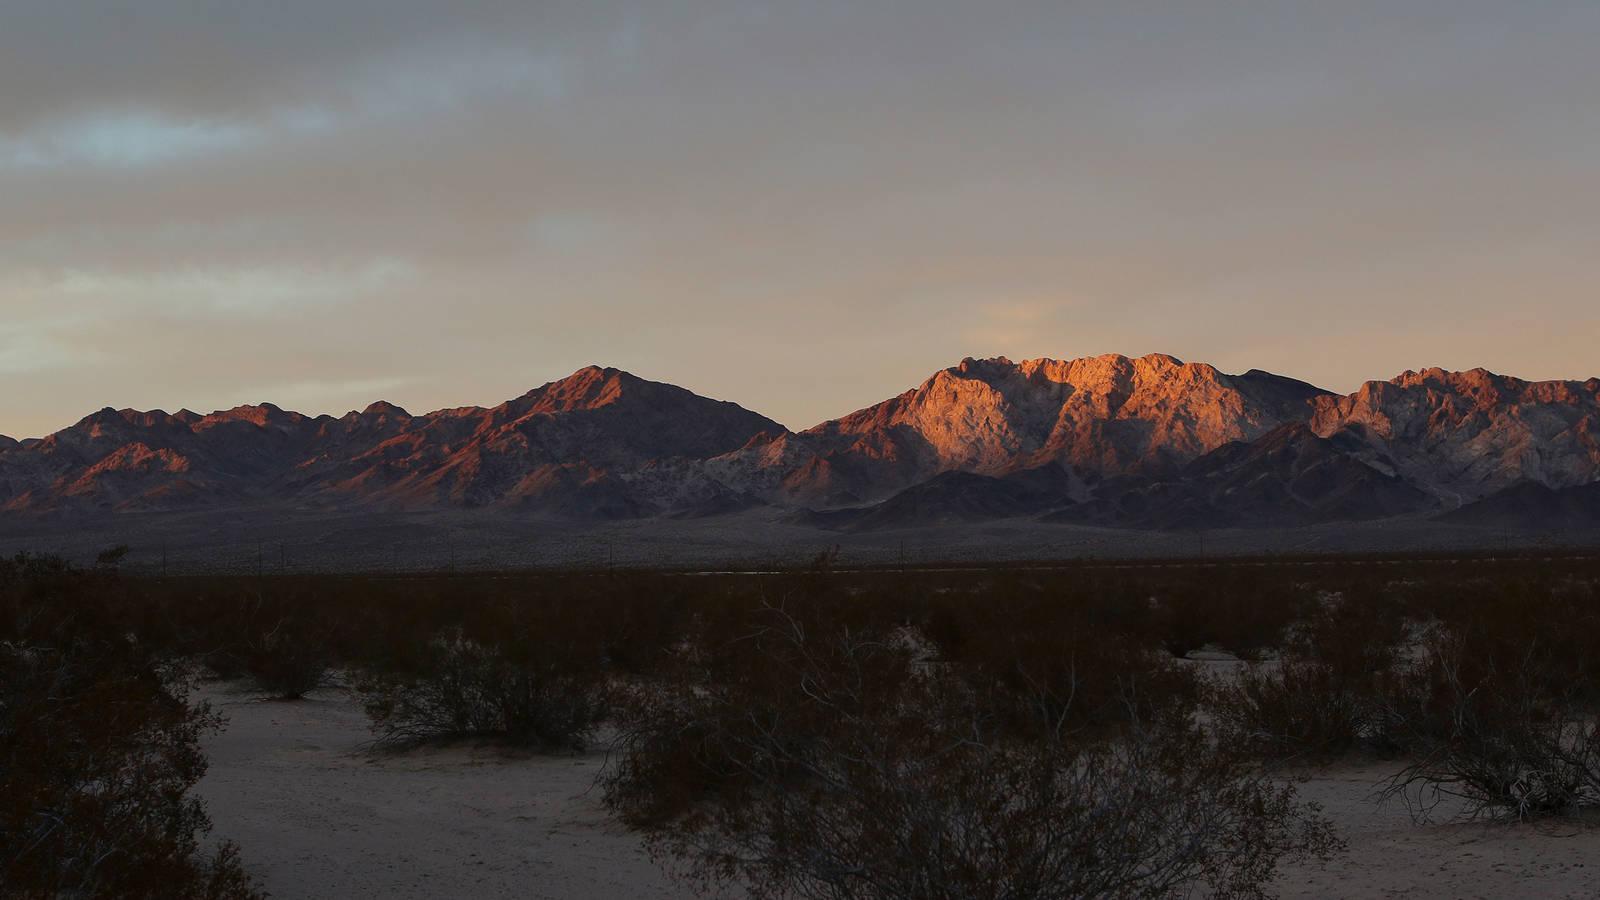 California Legislation Protects Desert, Calls Water Mining Proposal Into Question